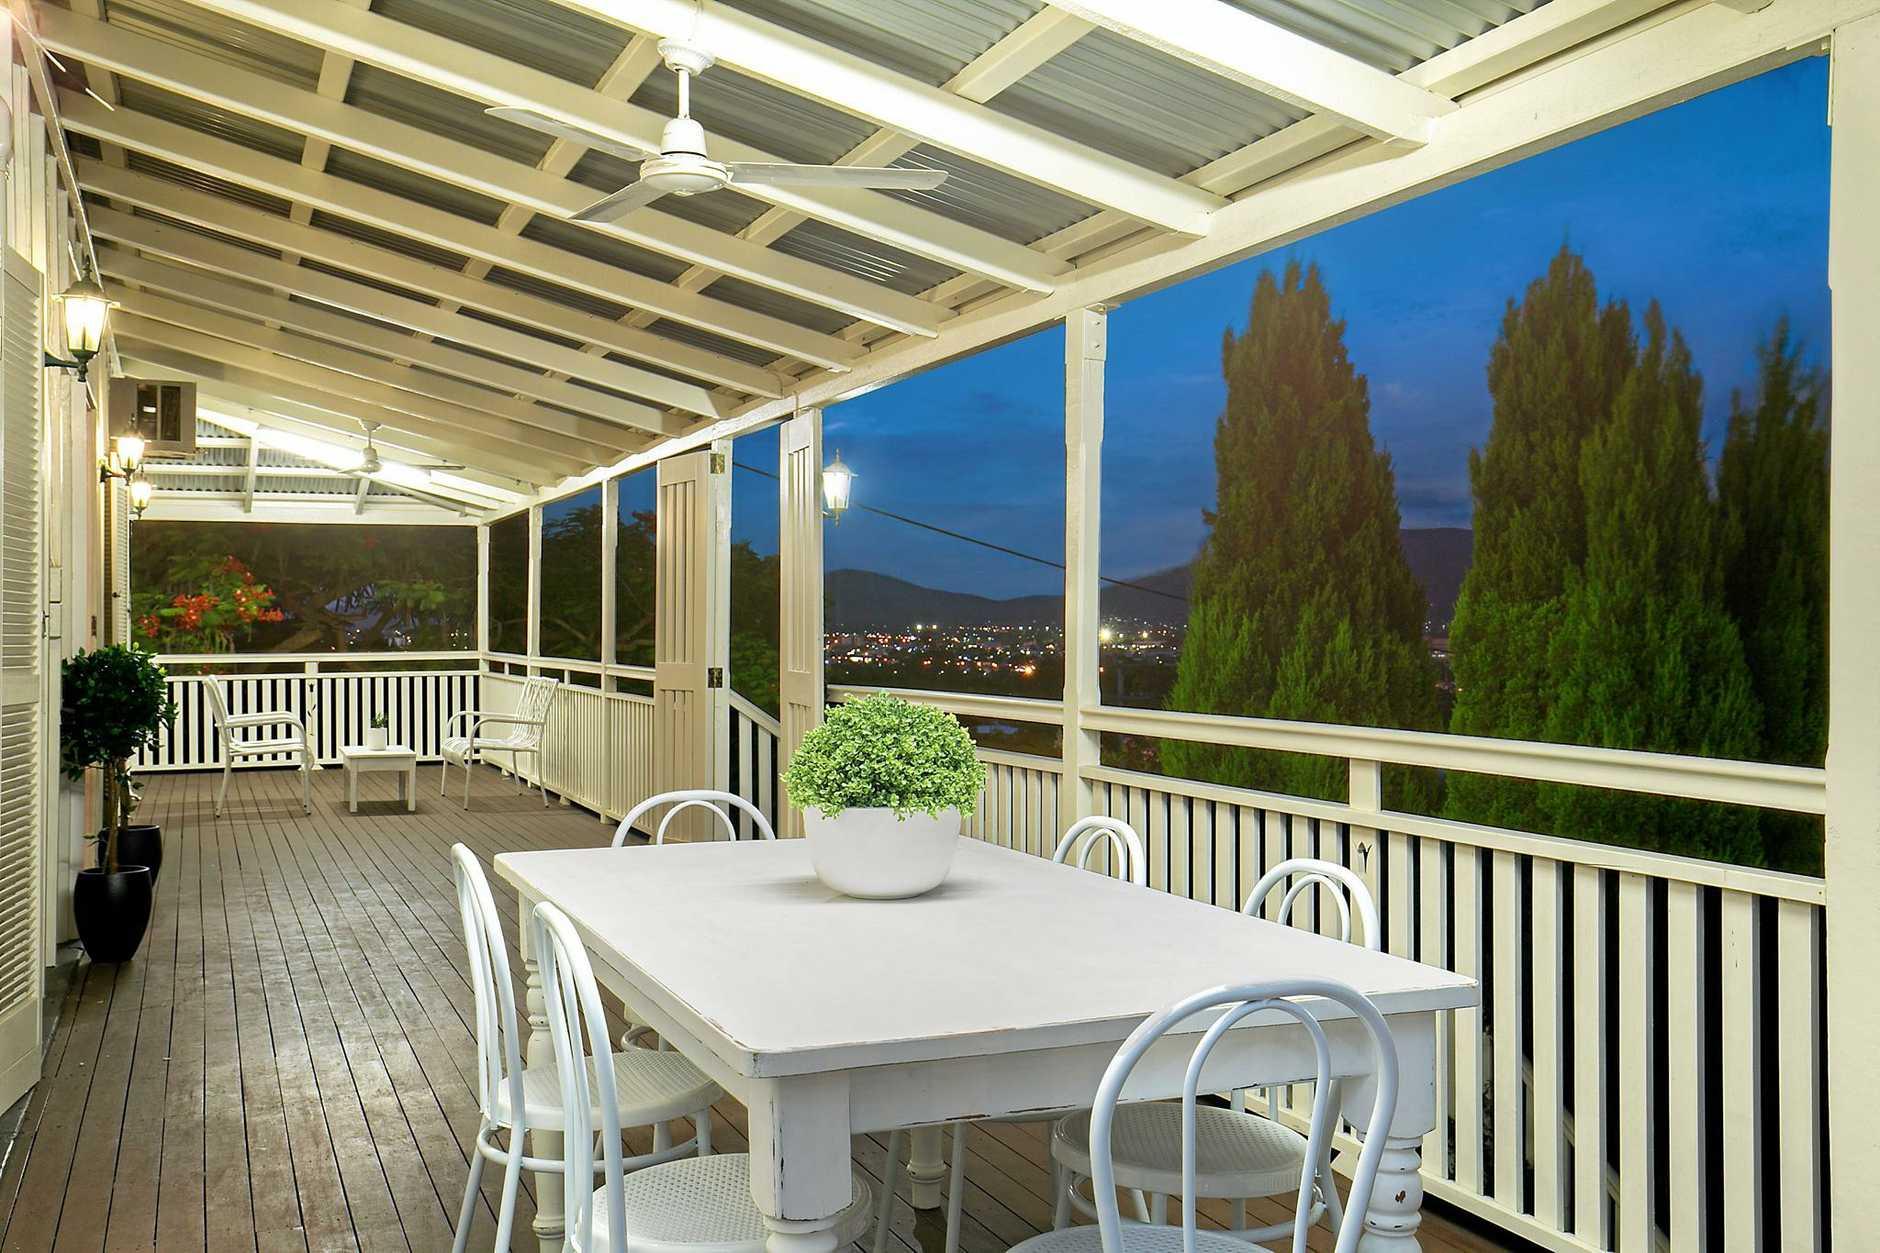 The balcony overlooking the stunning views of Rockhampton city.